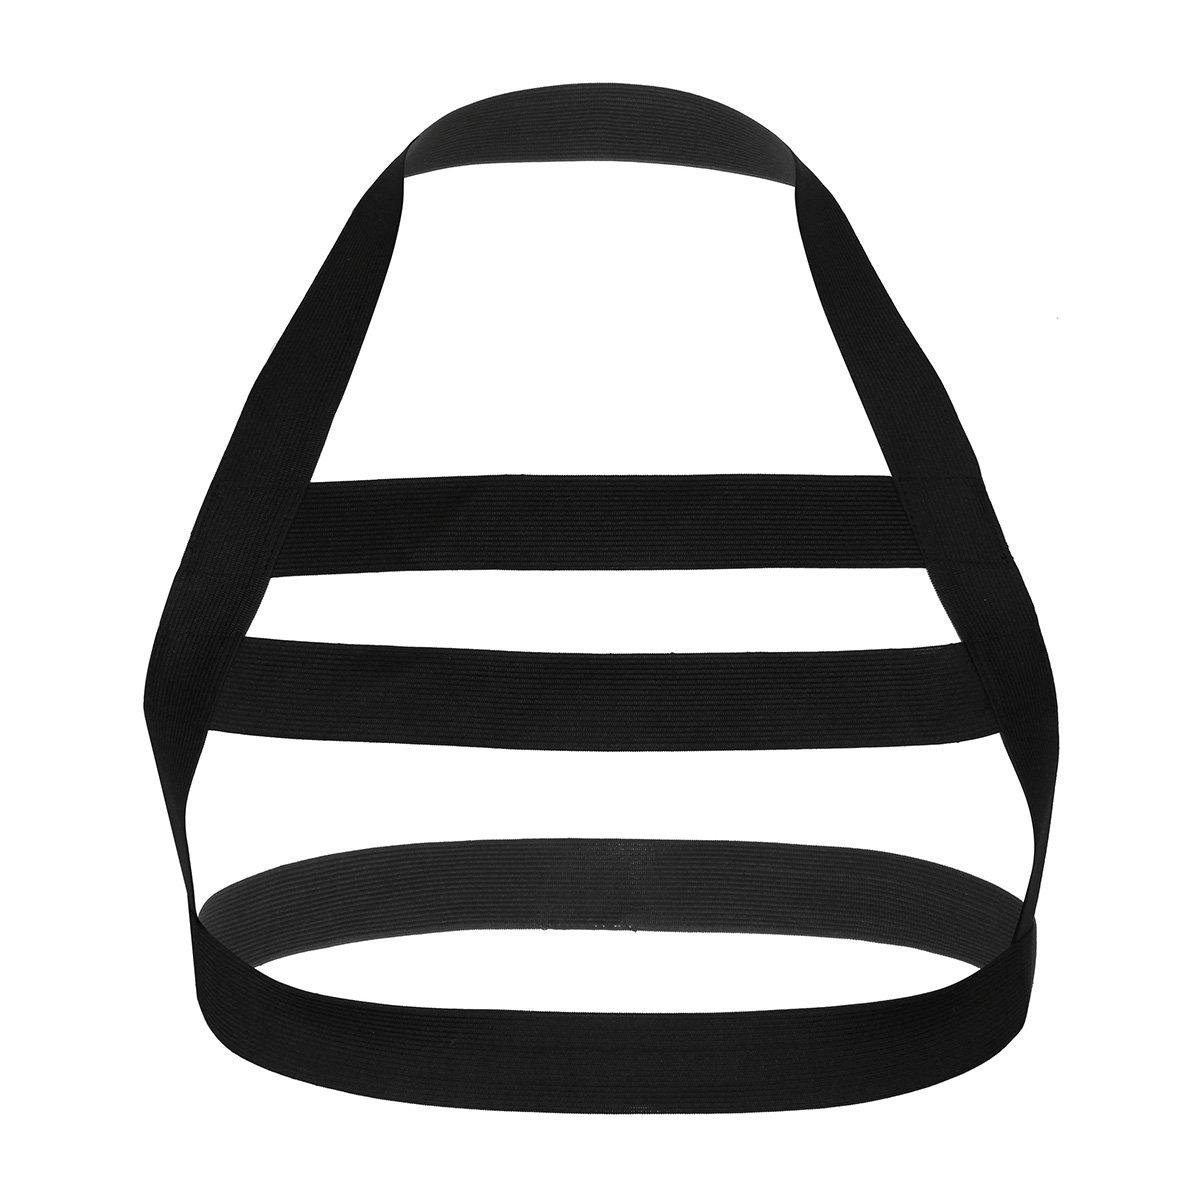 iEFiEL Men Nylon Halter Neck Elastic Body Chest Harness Costume Belt Black One Size